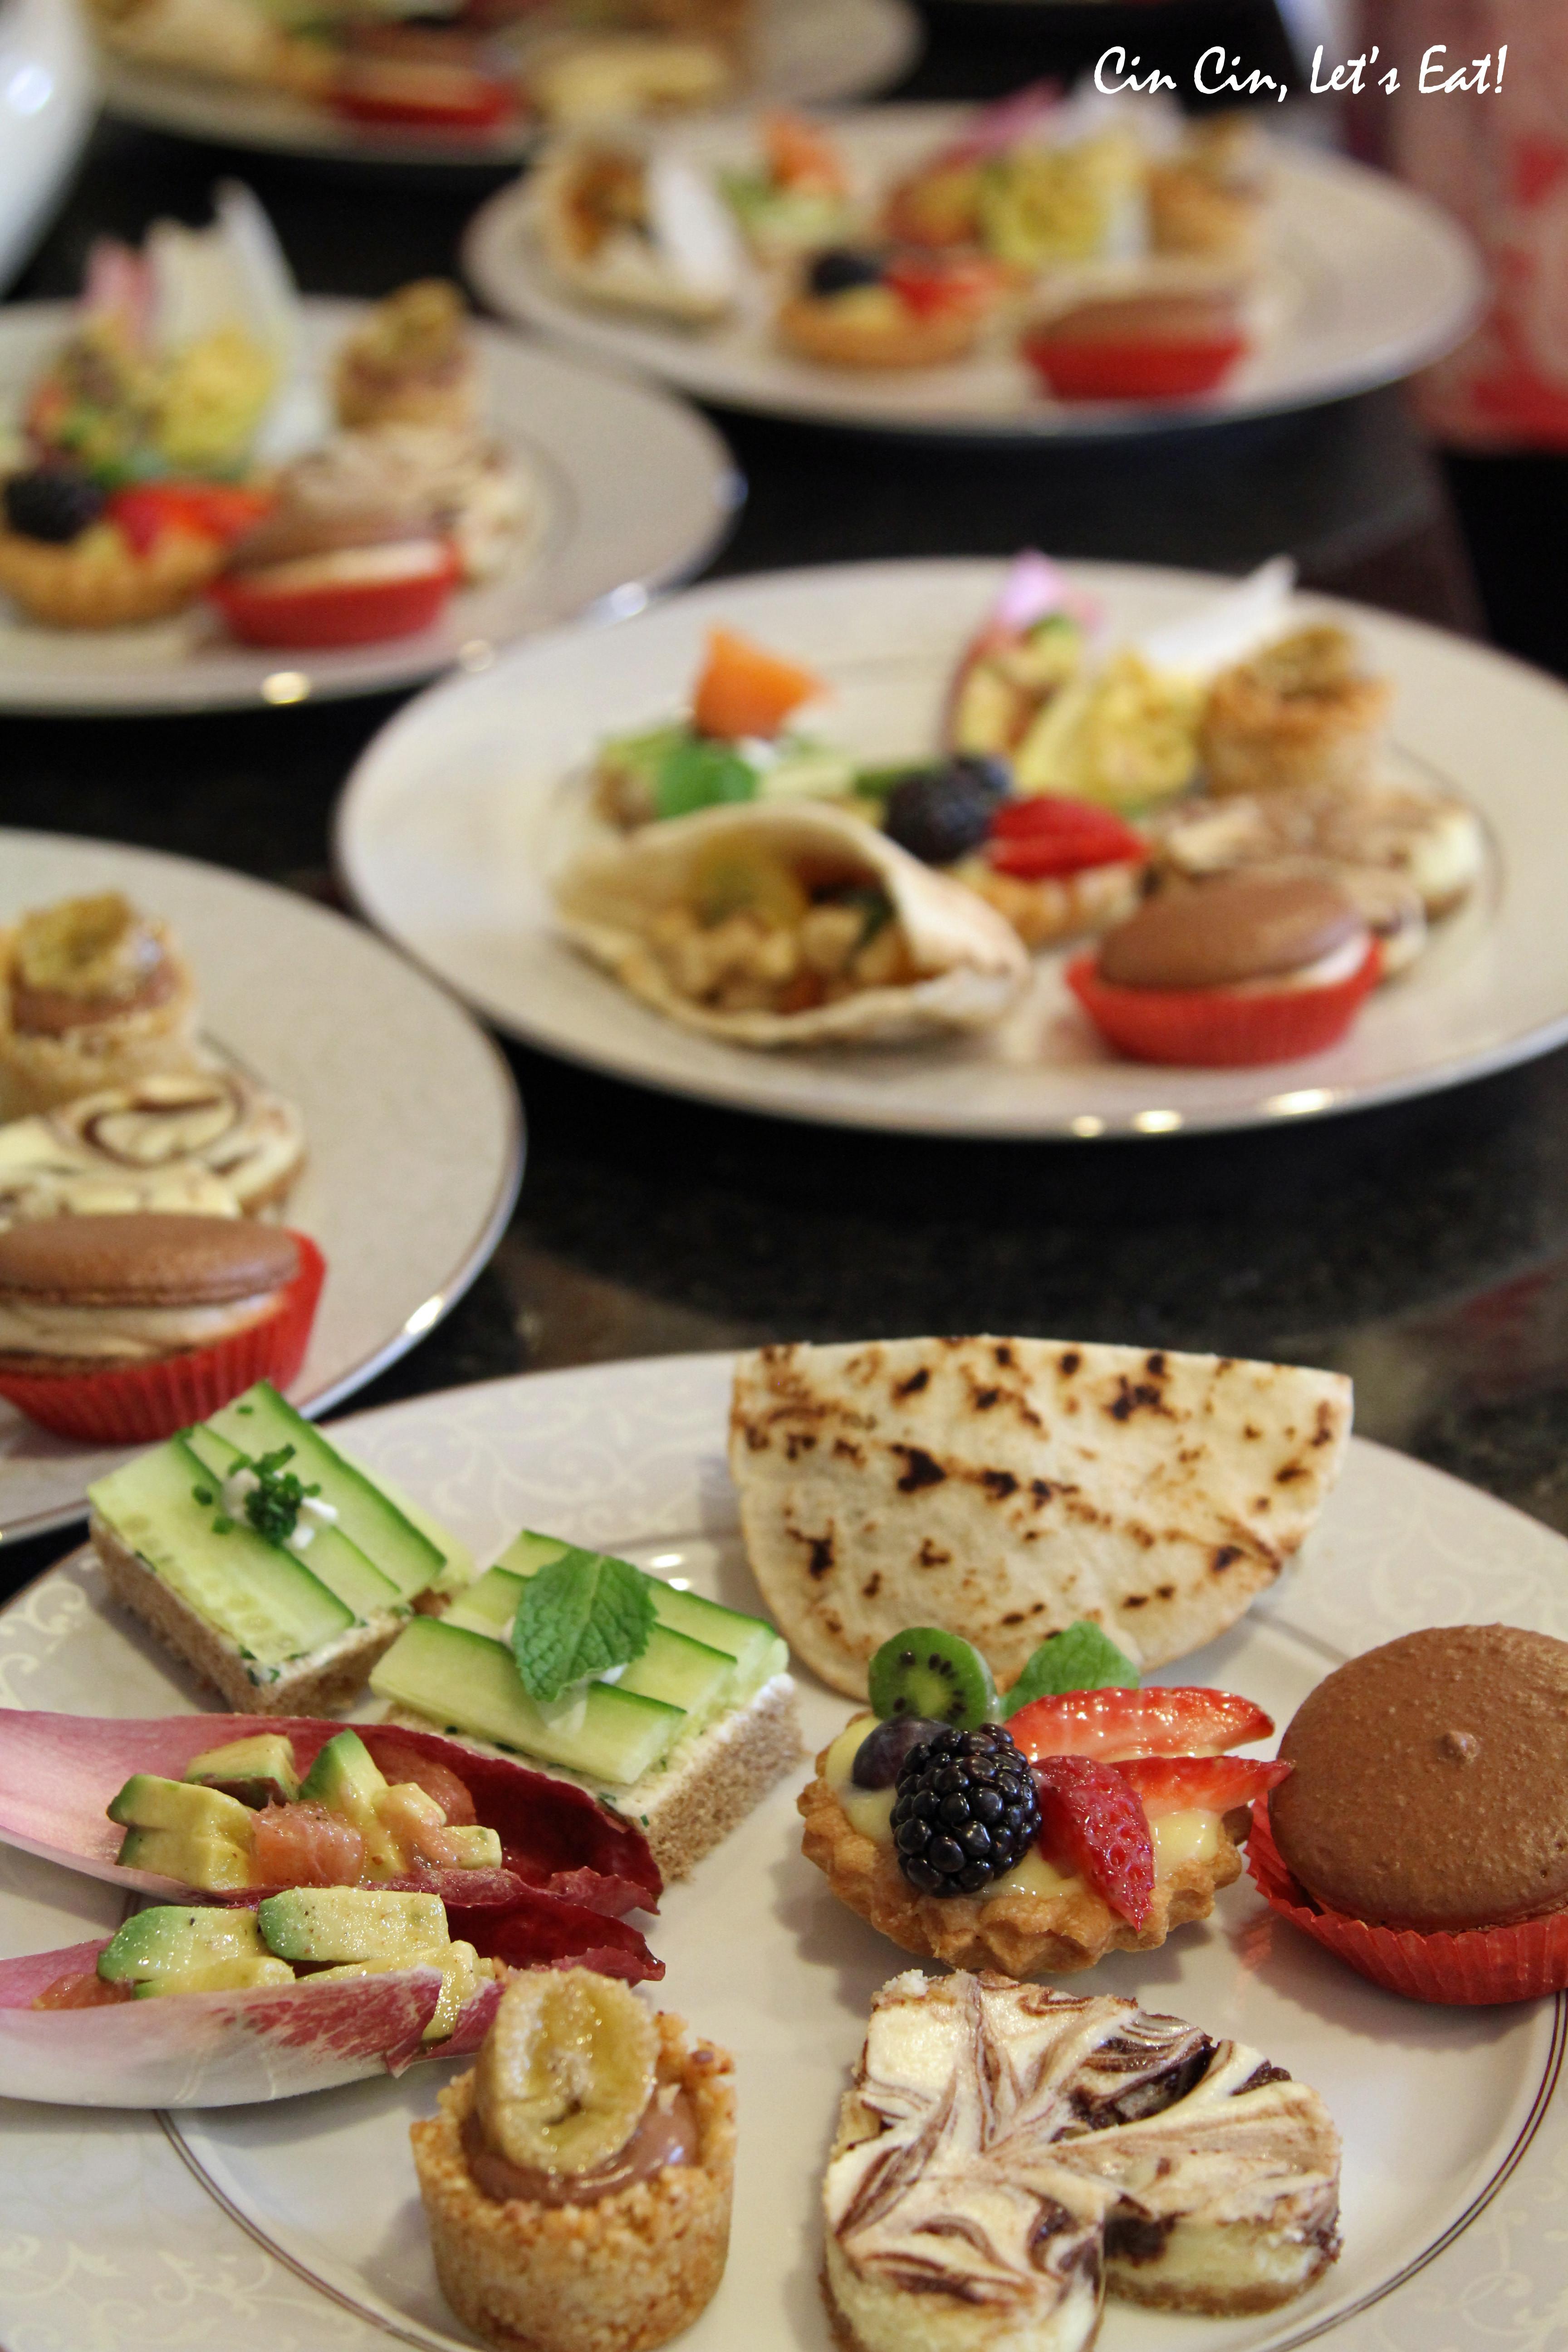 Tea Party Snack Ideas  Tea Party 2012 [recipes] – Cin Cin Let s Eat